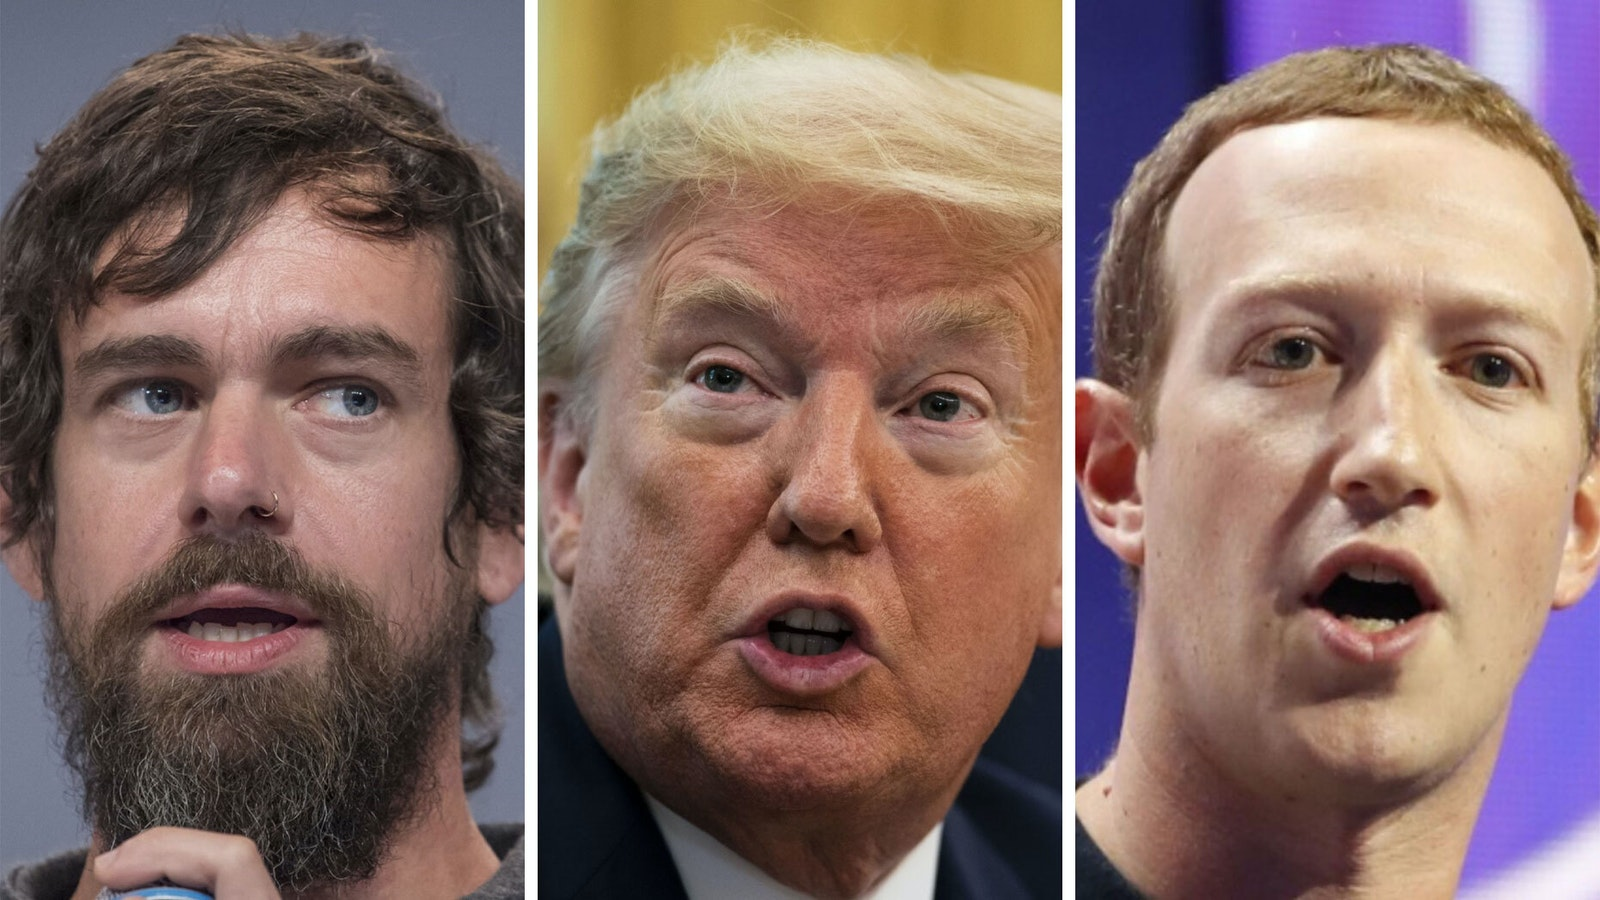 Twitter's Jack Dorsey, President Trump and Facebook's Mark Zuckerberg. Photos by Bloomberg